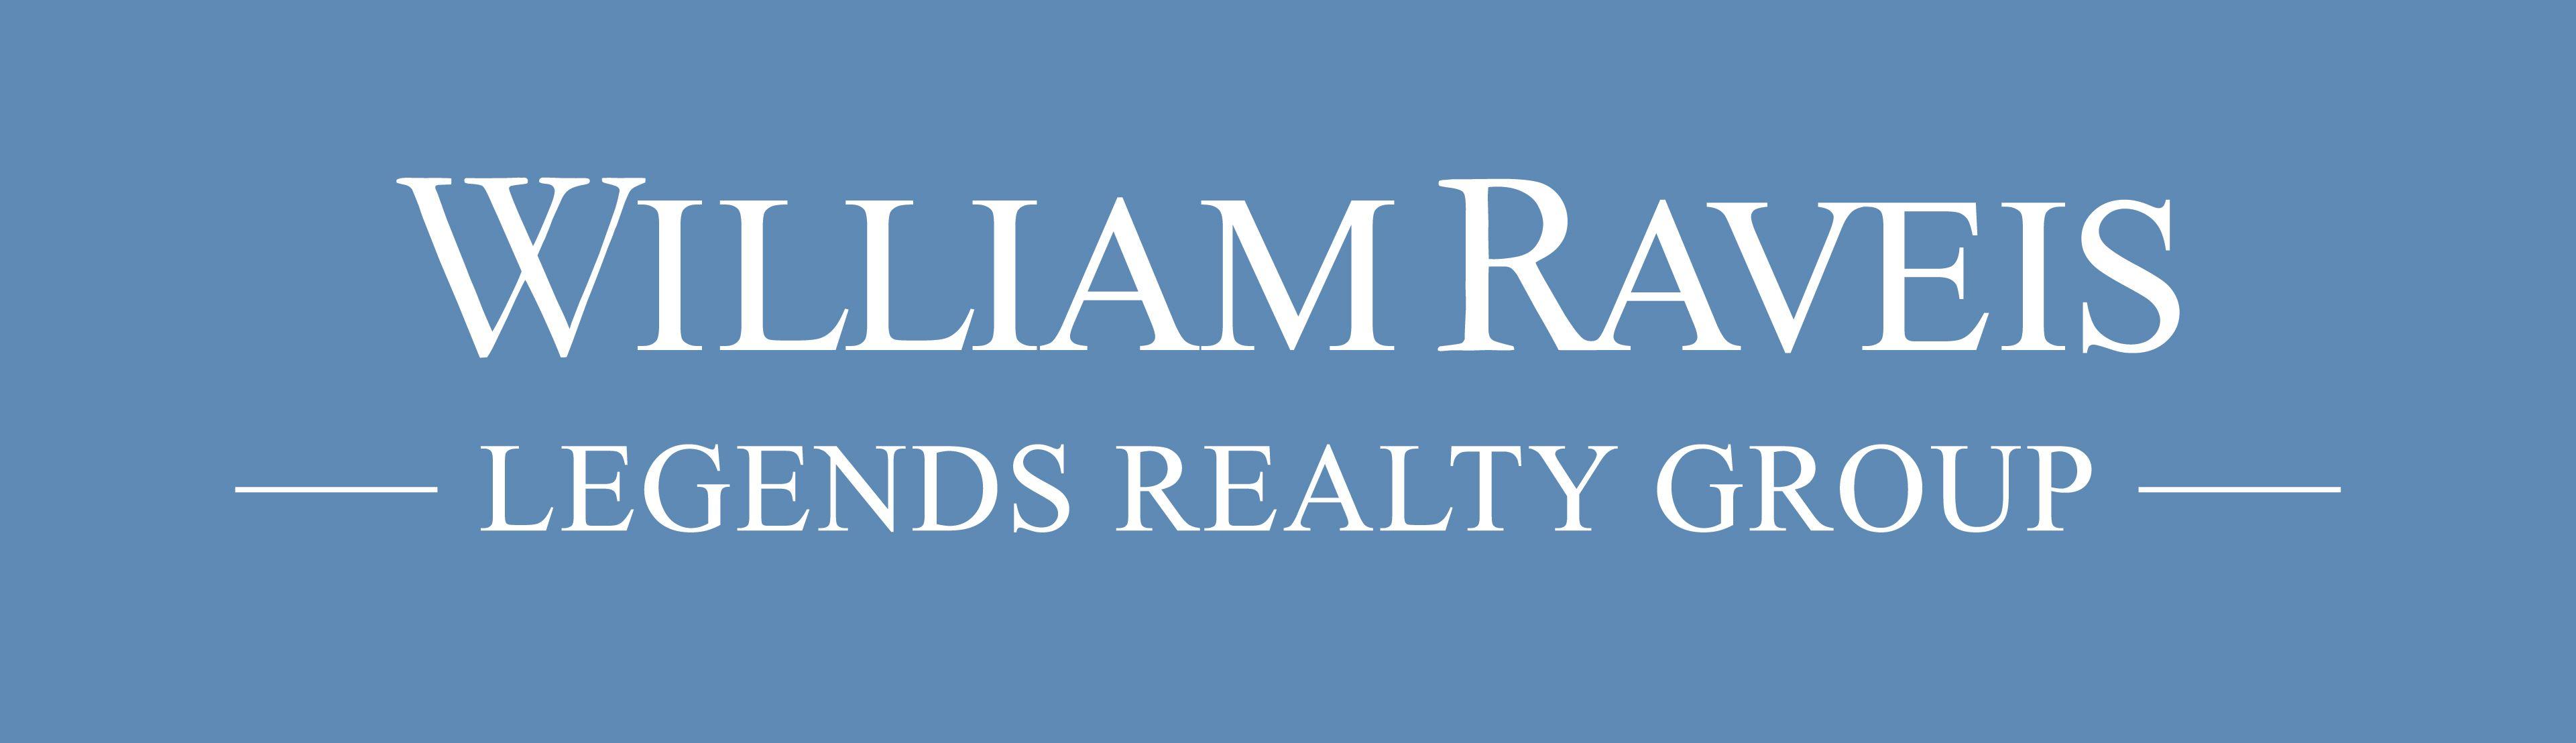 William Raveis Legends Realty Group Phyllis Lerner | Realtor